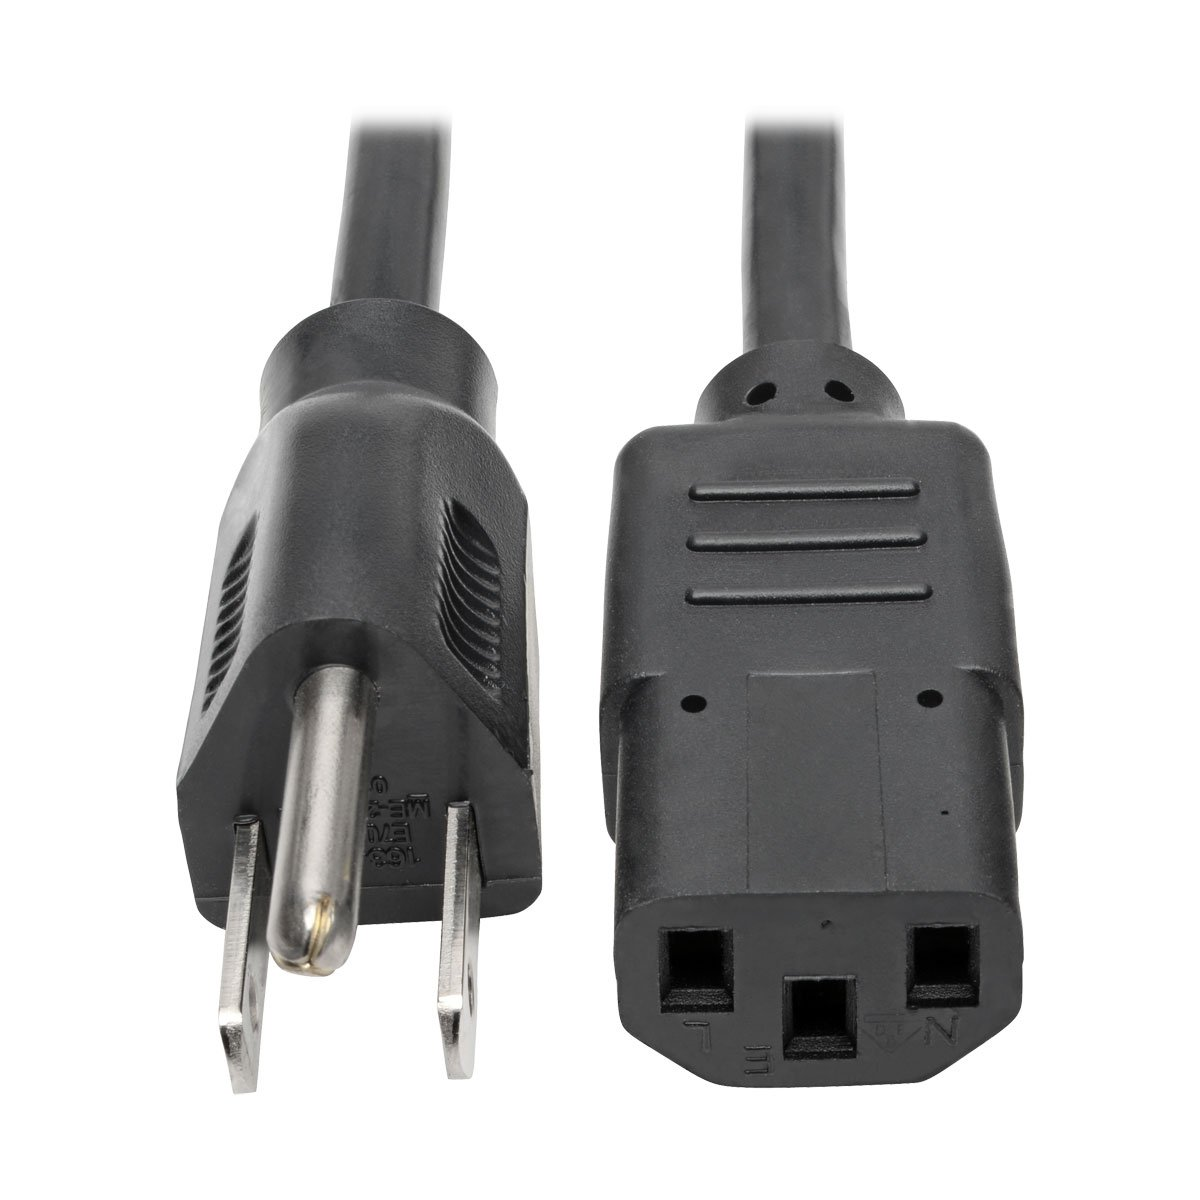 Tripp Lite P006-003 NEMA 5-15P to IEC-320-C13 18 AWG Power Cord (3 Feet)